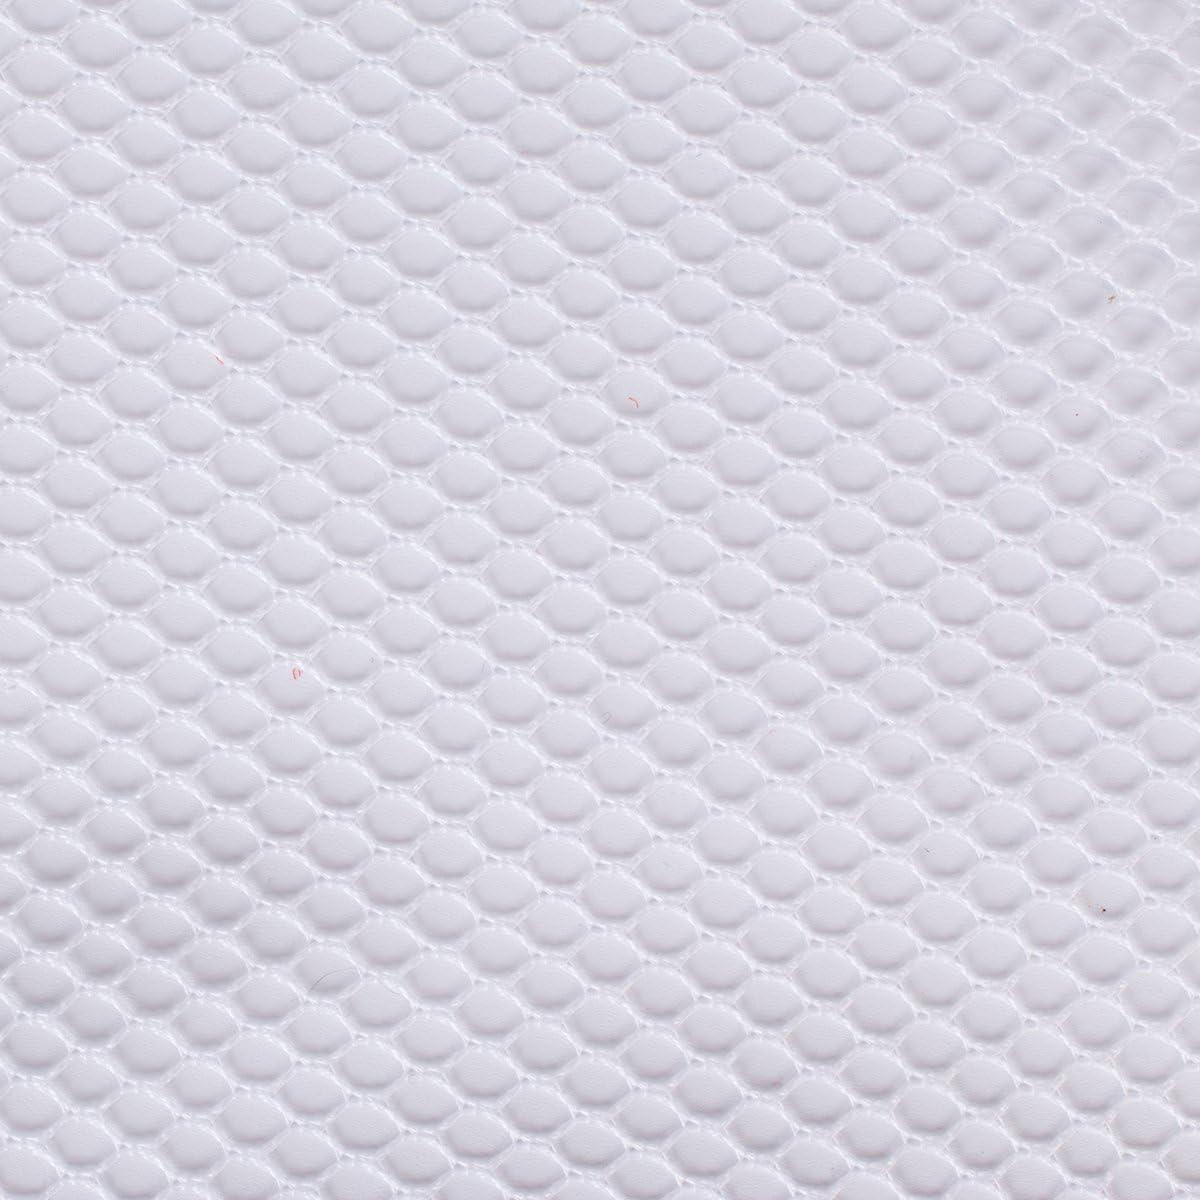 byannie sup209de White Lightweight Mesh Fabric, 18x 54Inch Aprox. 45,7x 137cm Red plástico, 100% poliéster, Blanco, 28x 20x 1cm